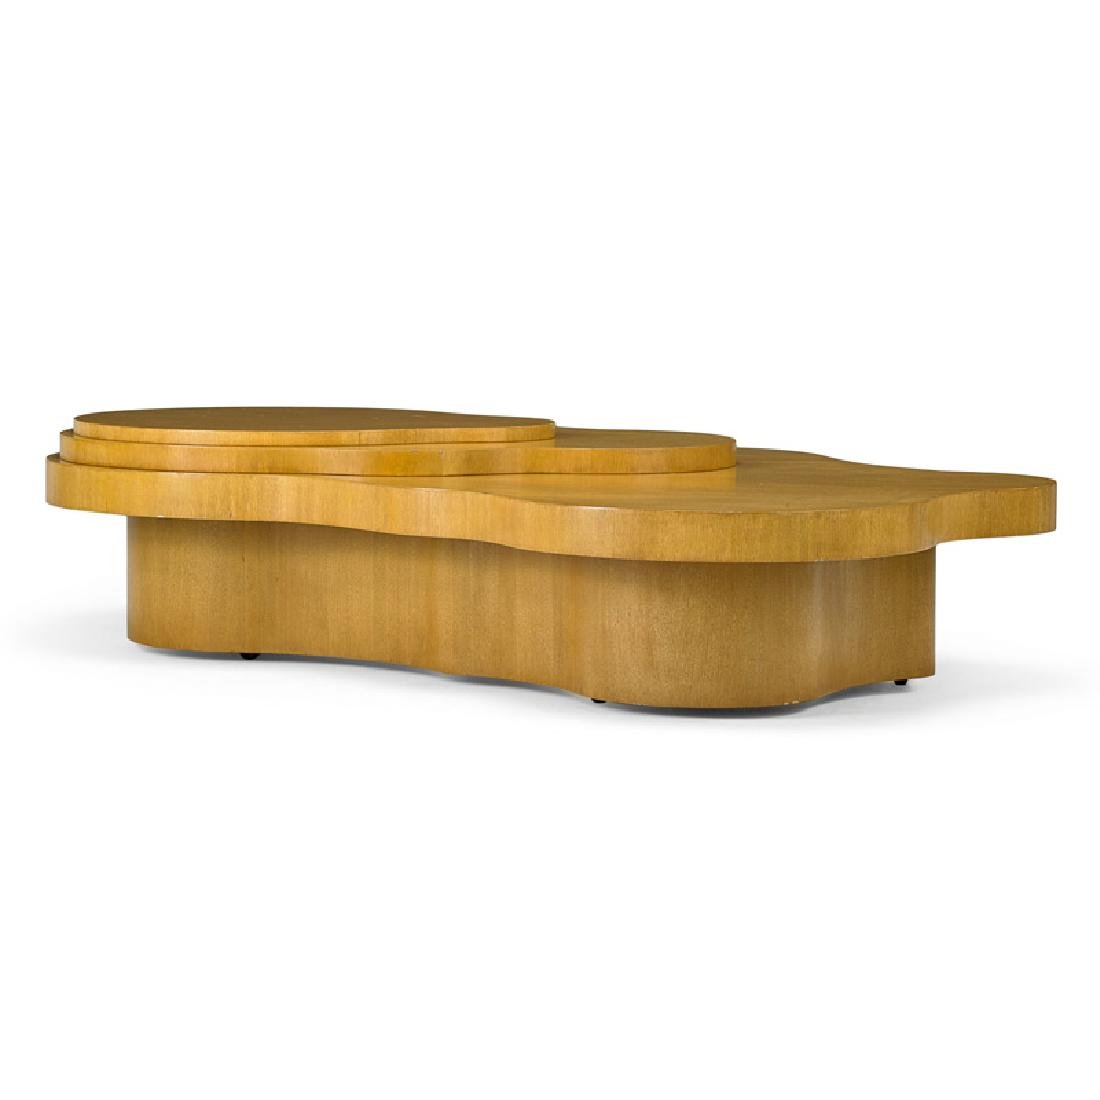 T.H. ROBSJOHN-GIBBINGS Large Mesa coffee table - 3